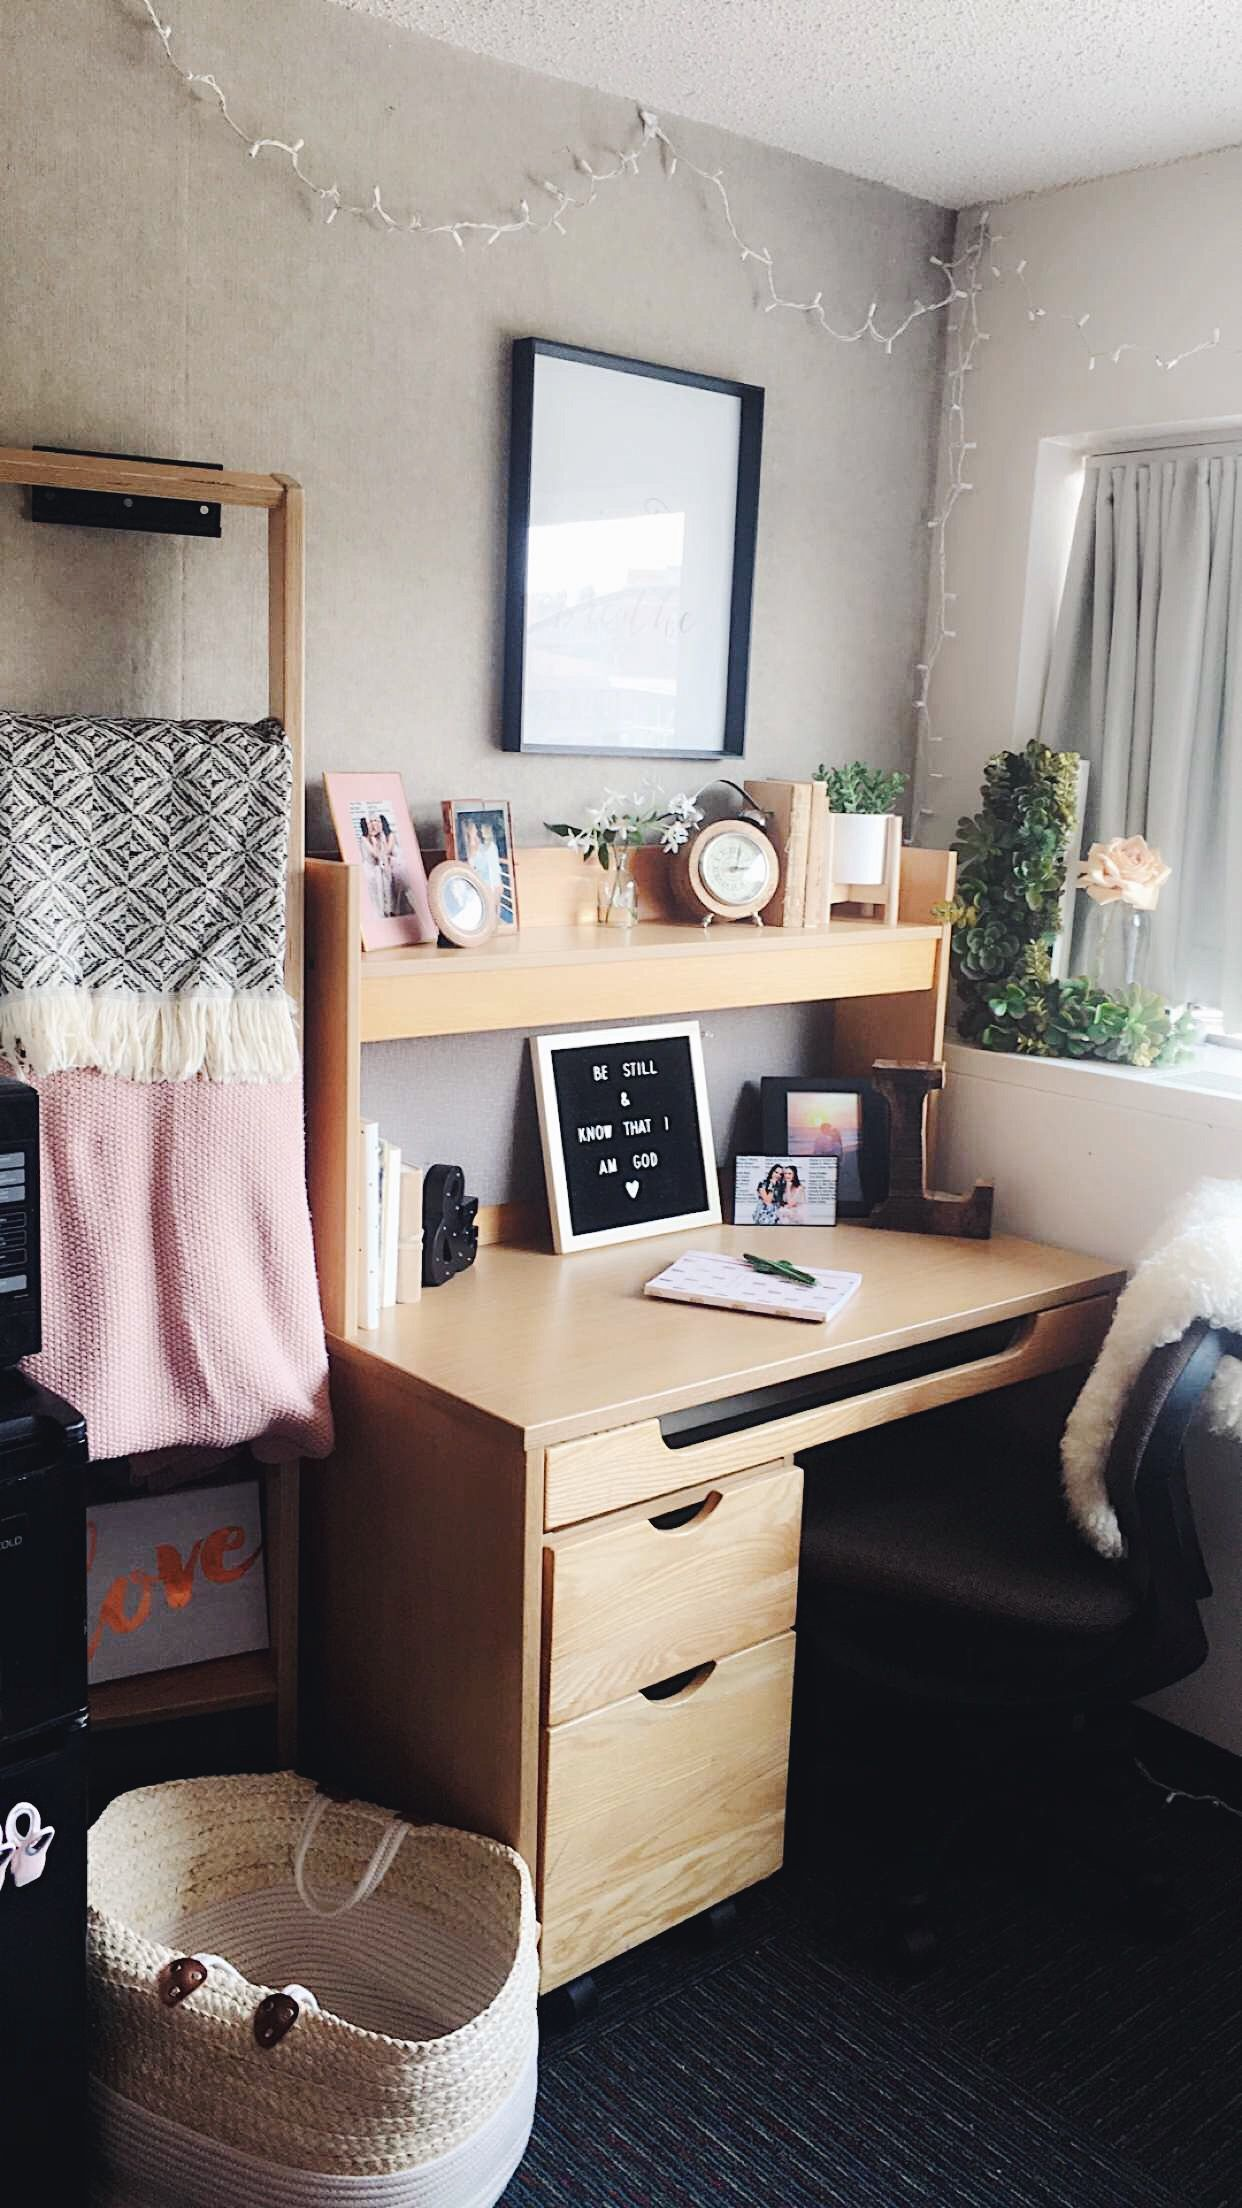 sarchappy dorm in 2019 dorm dorm room room rh pinterest com